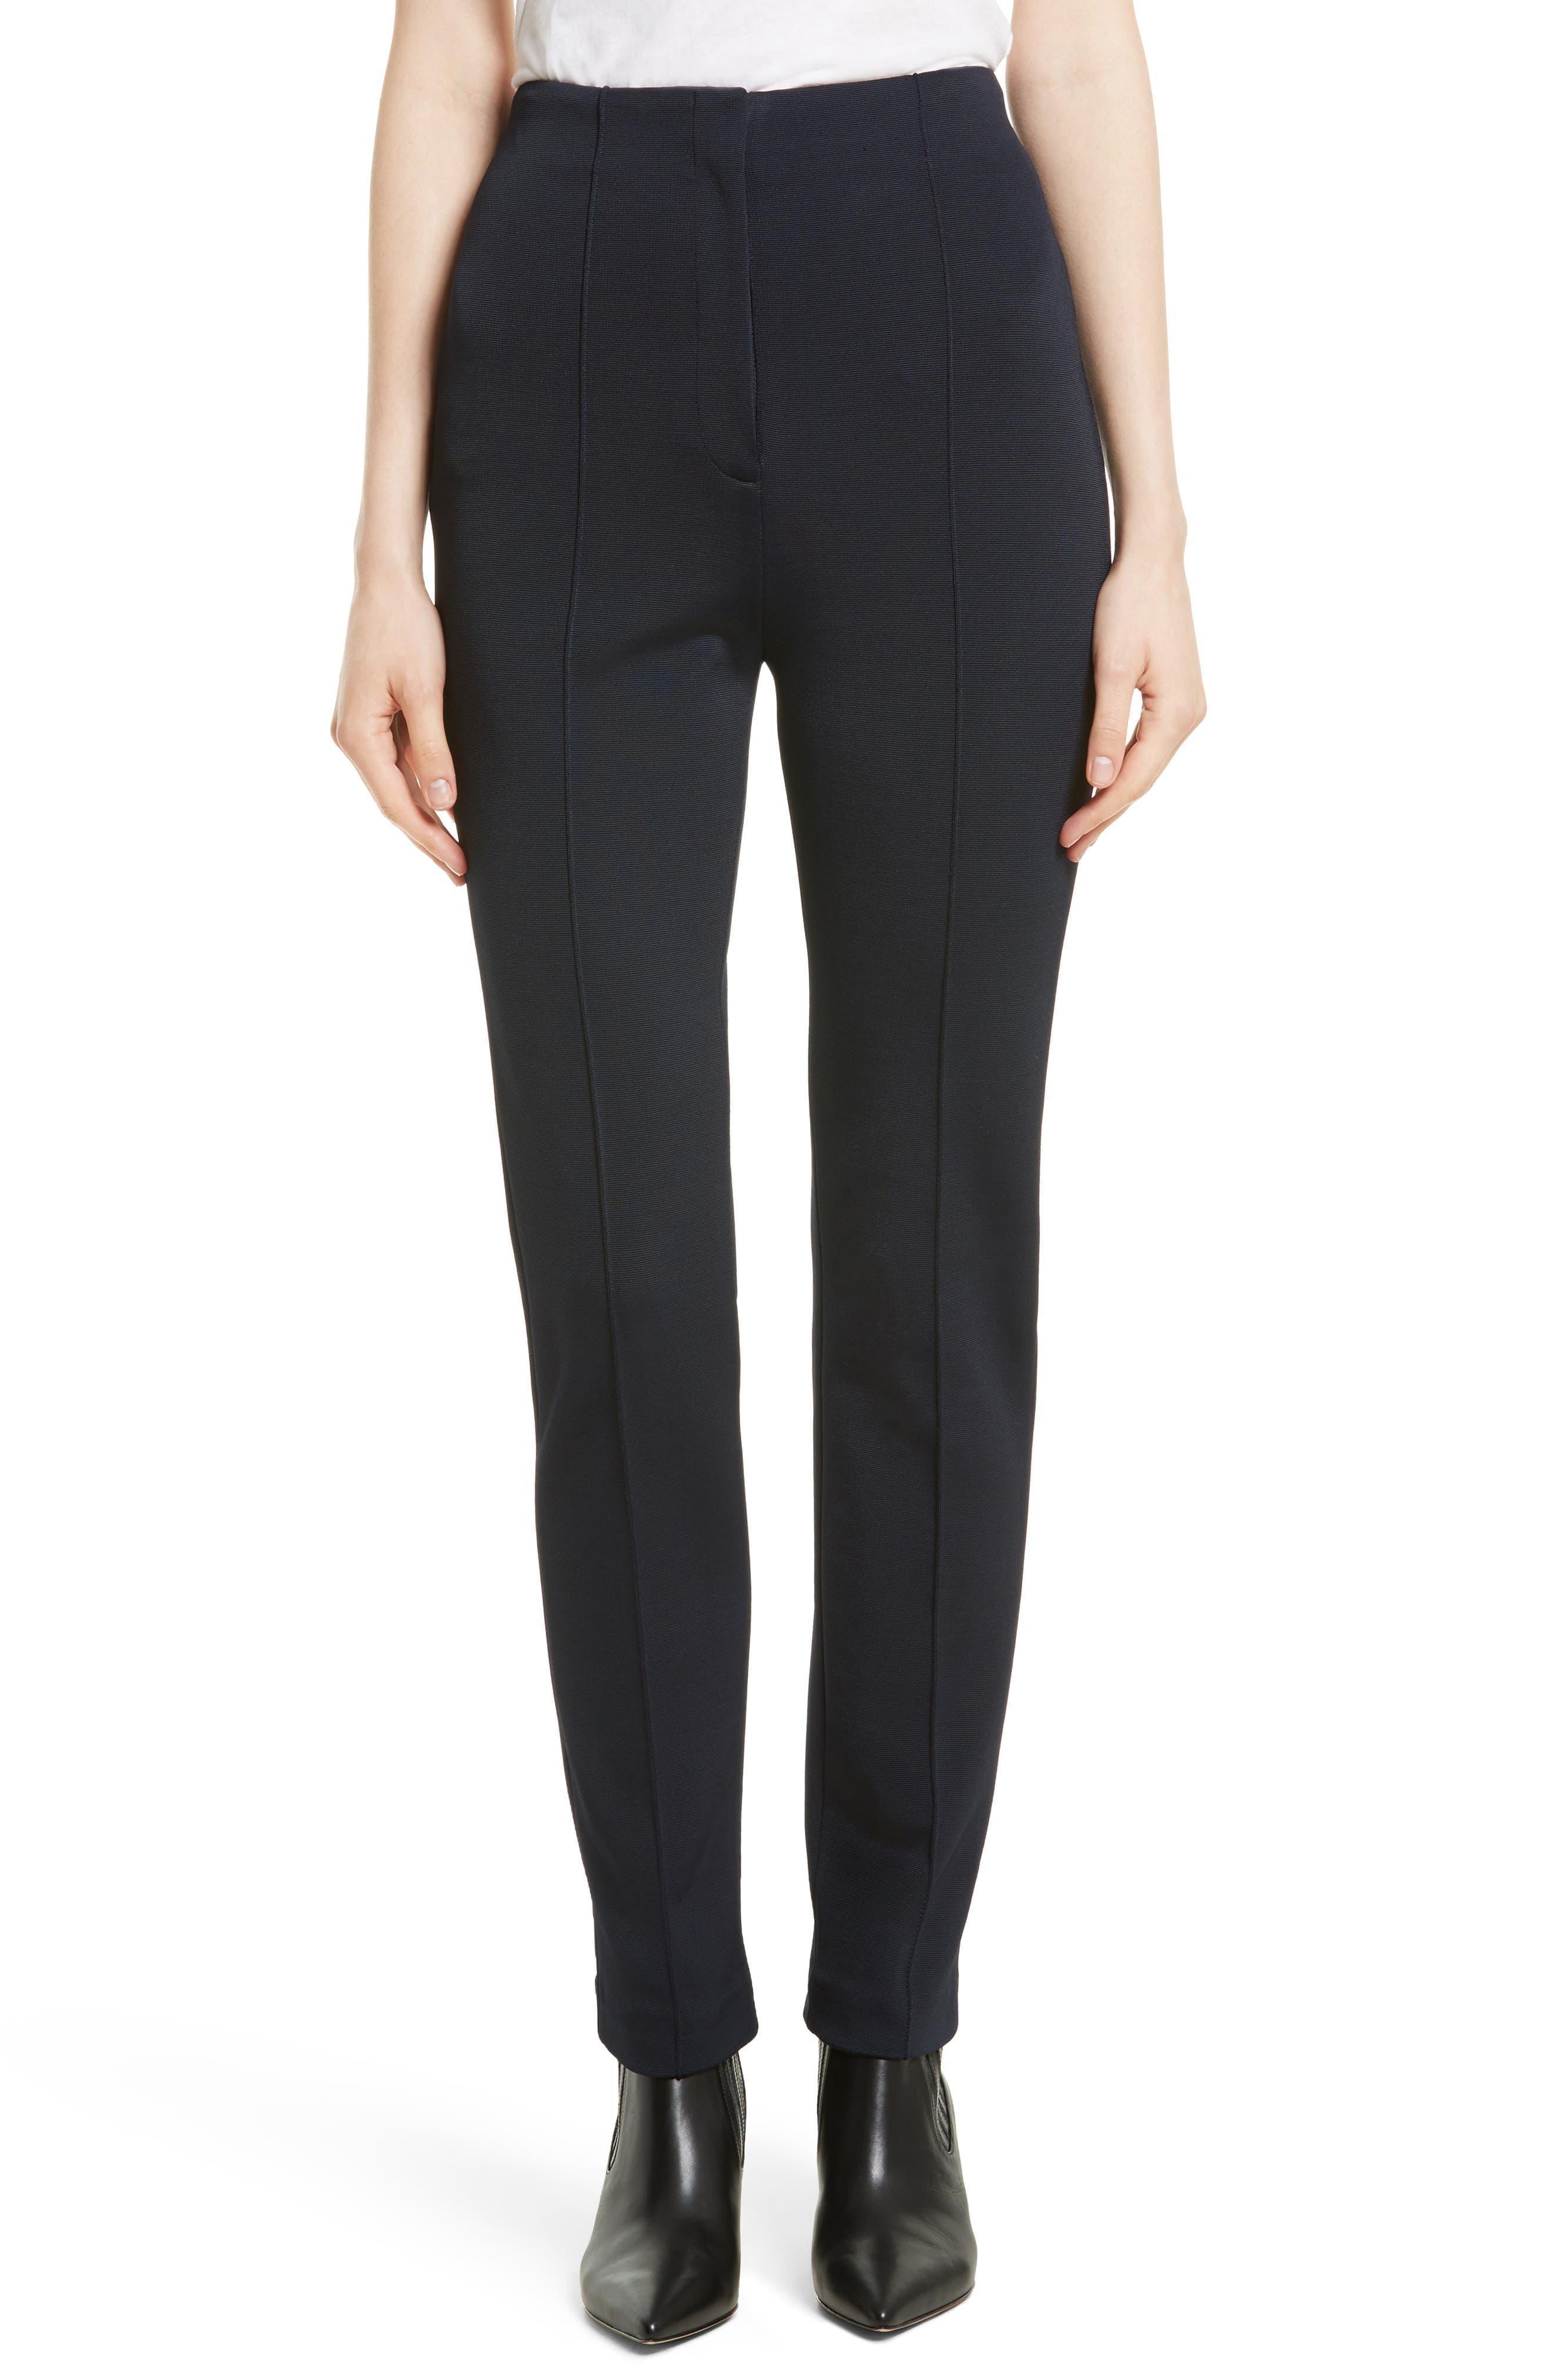 Alternate Image 1 Selected - Diane von Furstenberg High Waist Skinny Pants